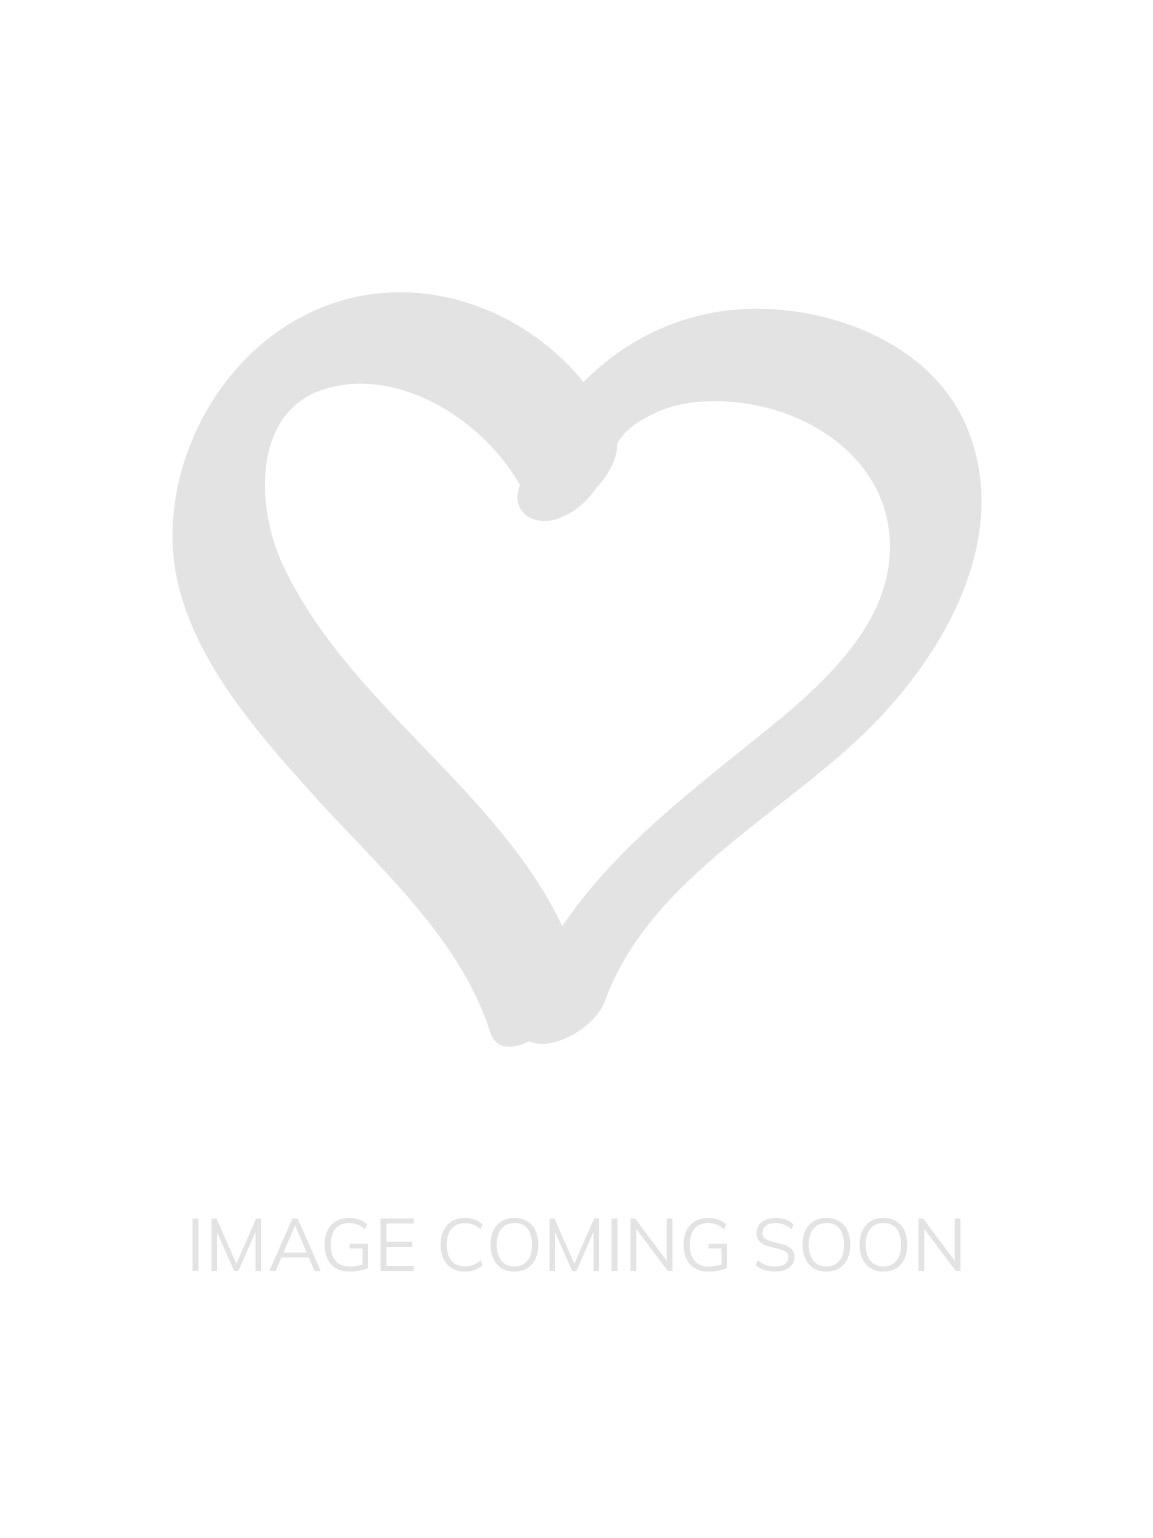 c1f47db1c1b Bridal Strapless Basque - Ivory